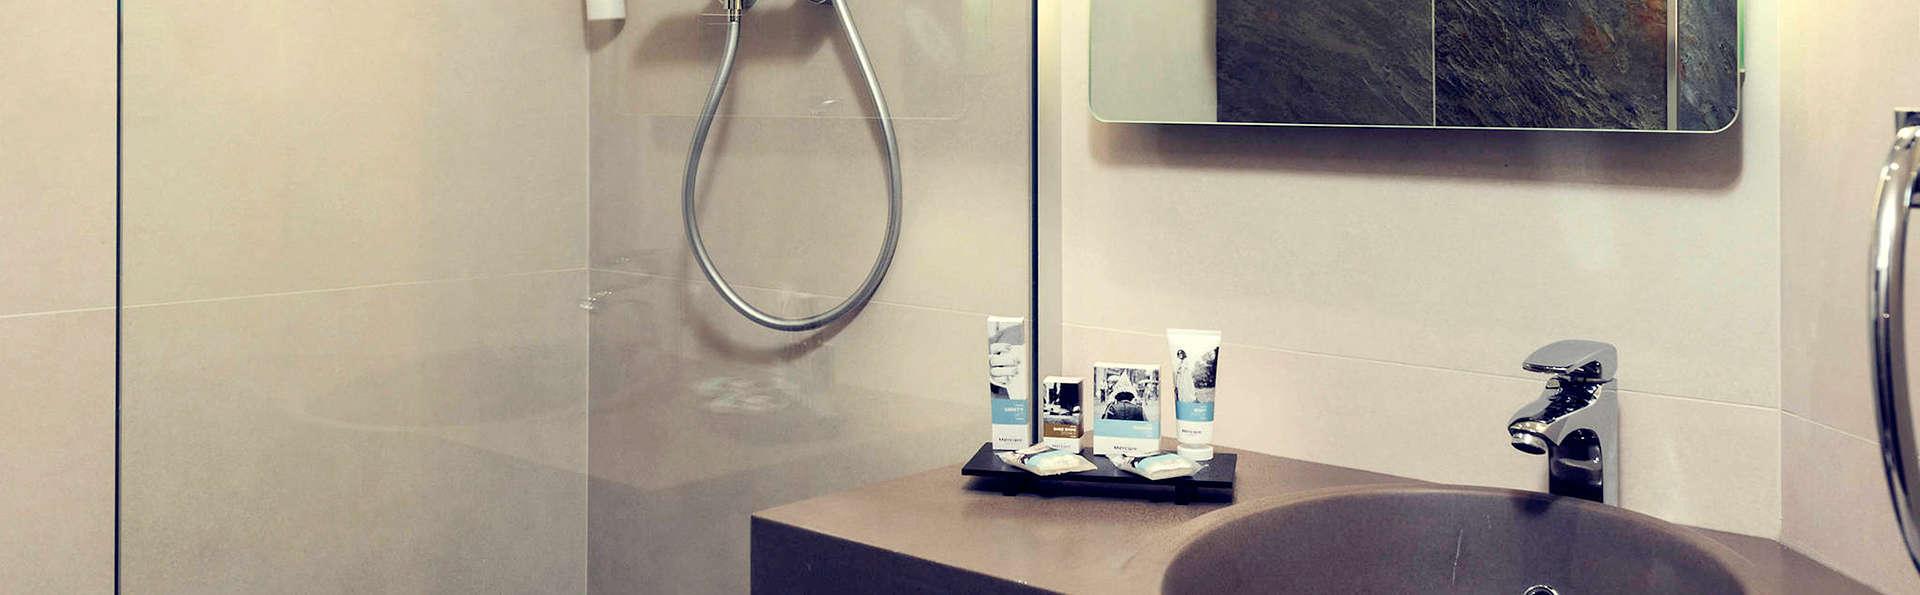 Hotel Mercure Paris Porte de Pantin - Edit_Bathroom.jpg